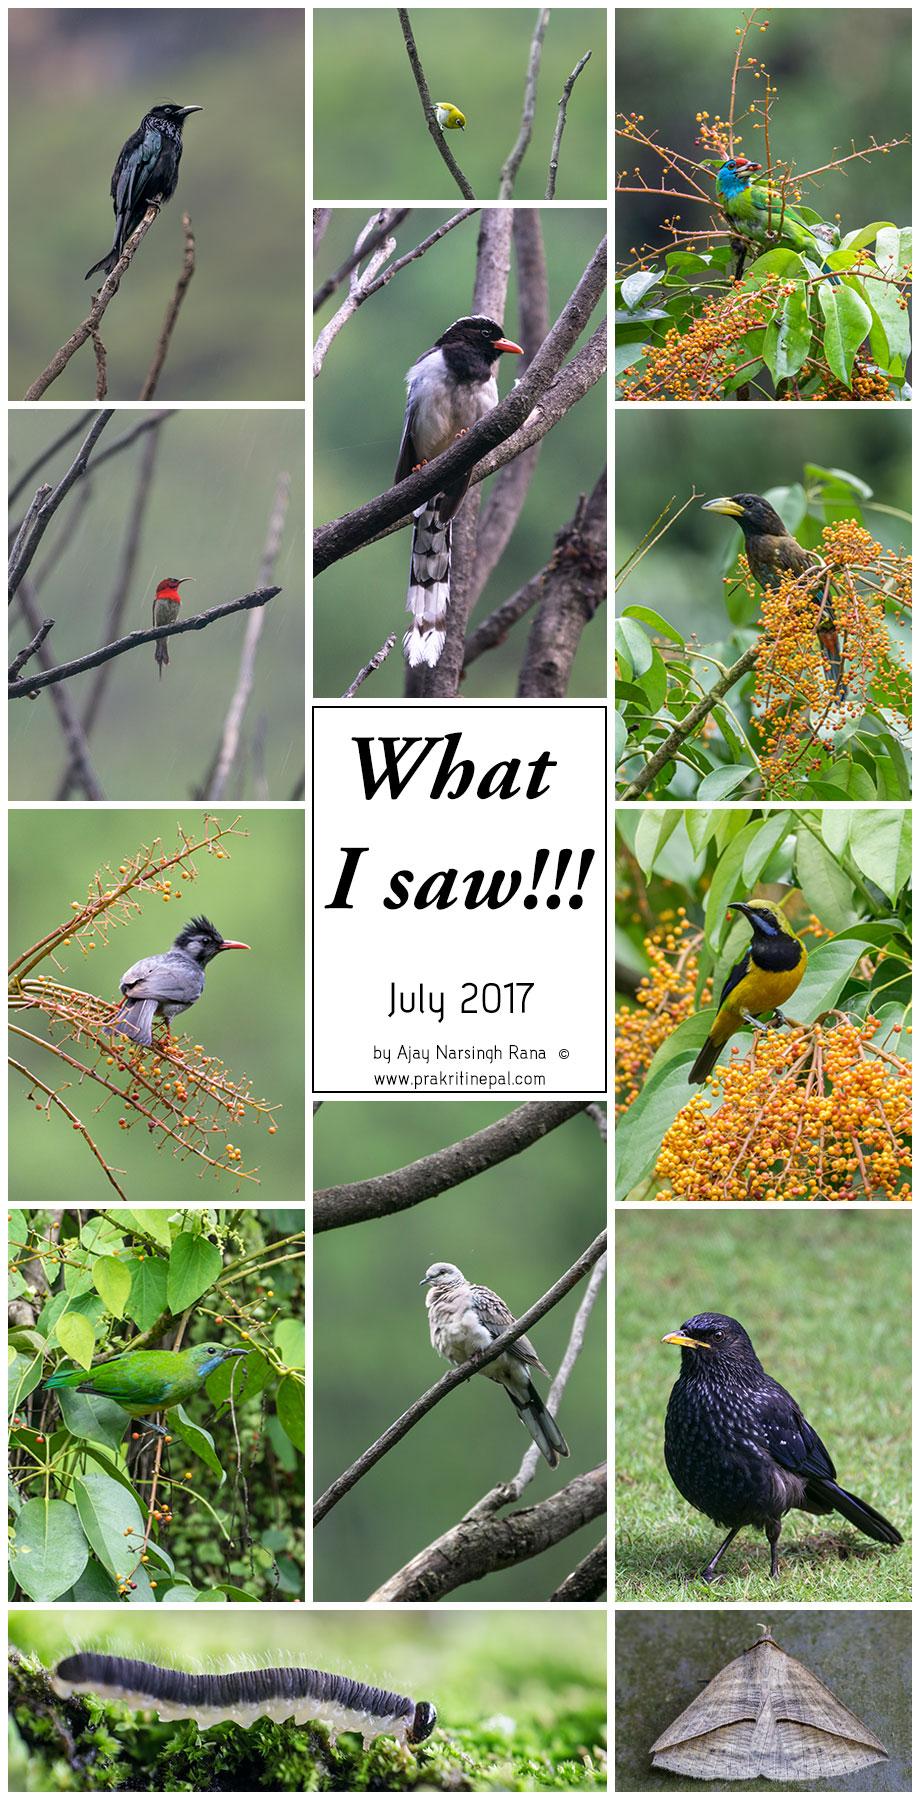 What I saw - July 2017